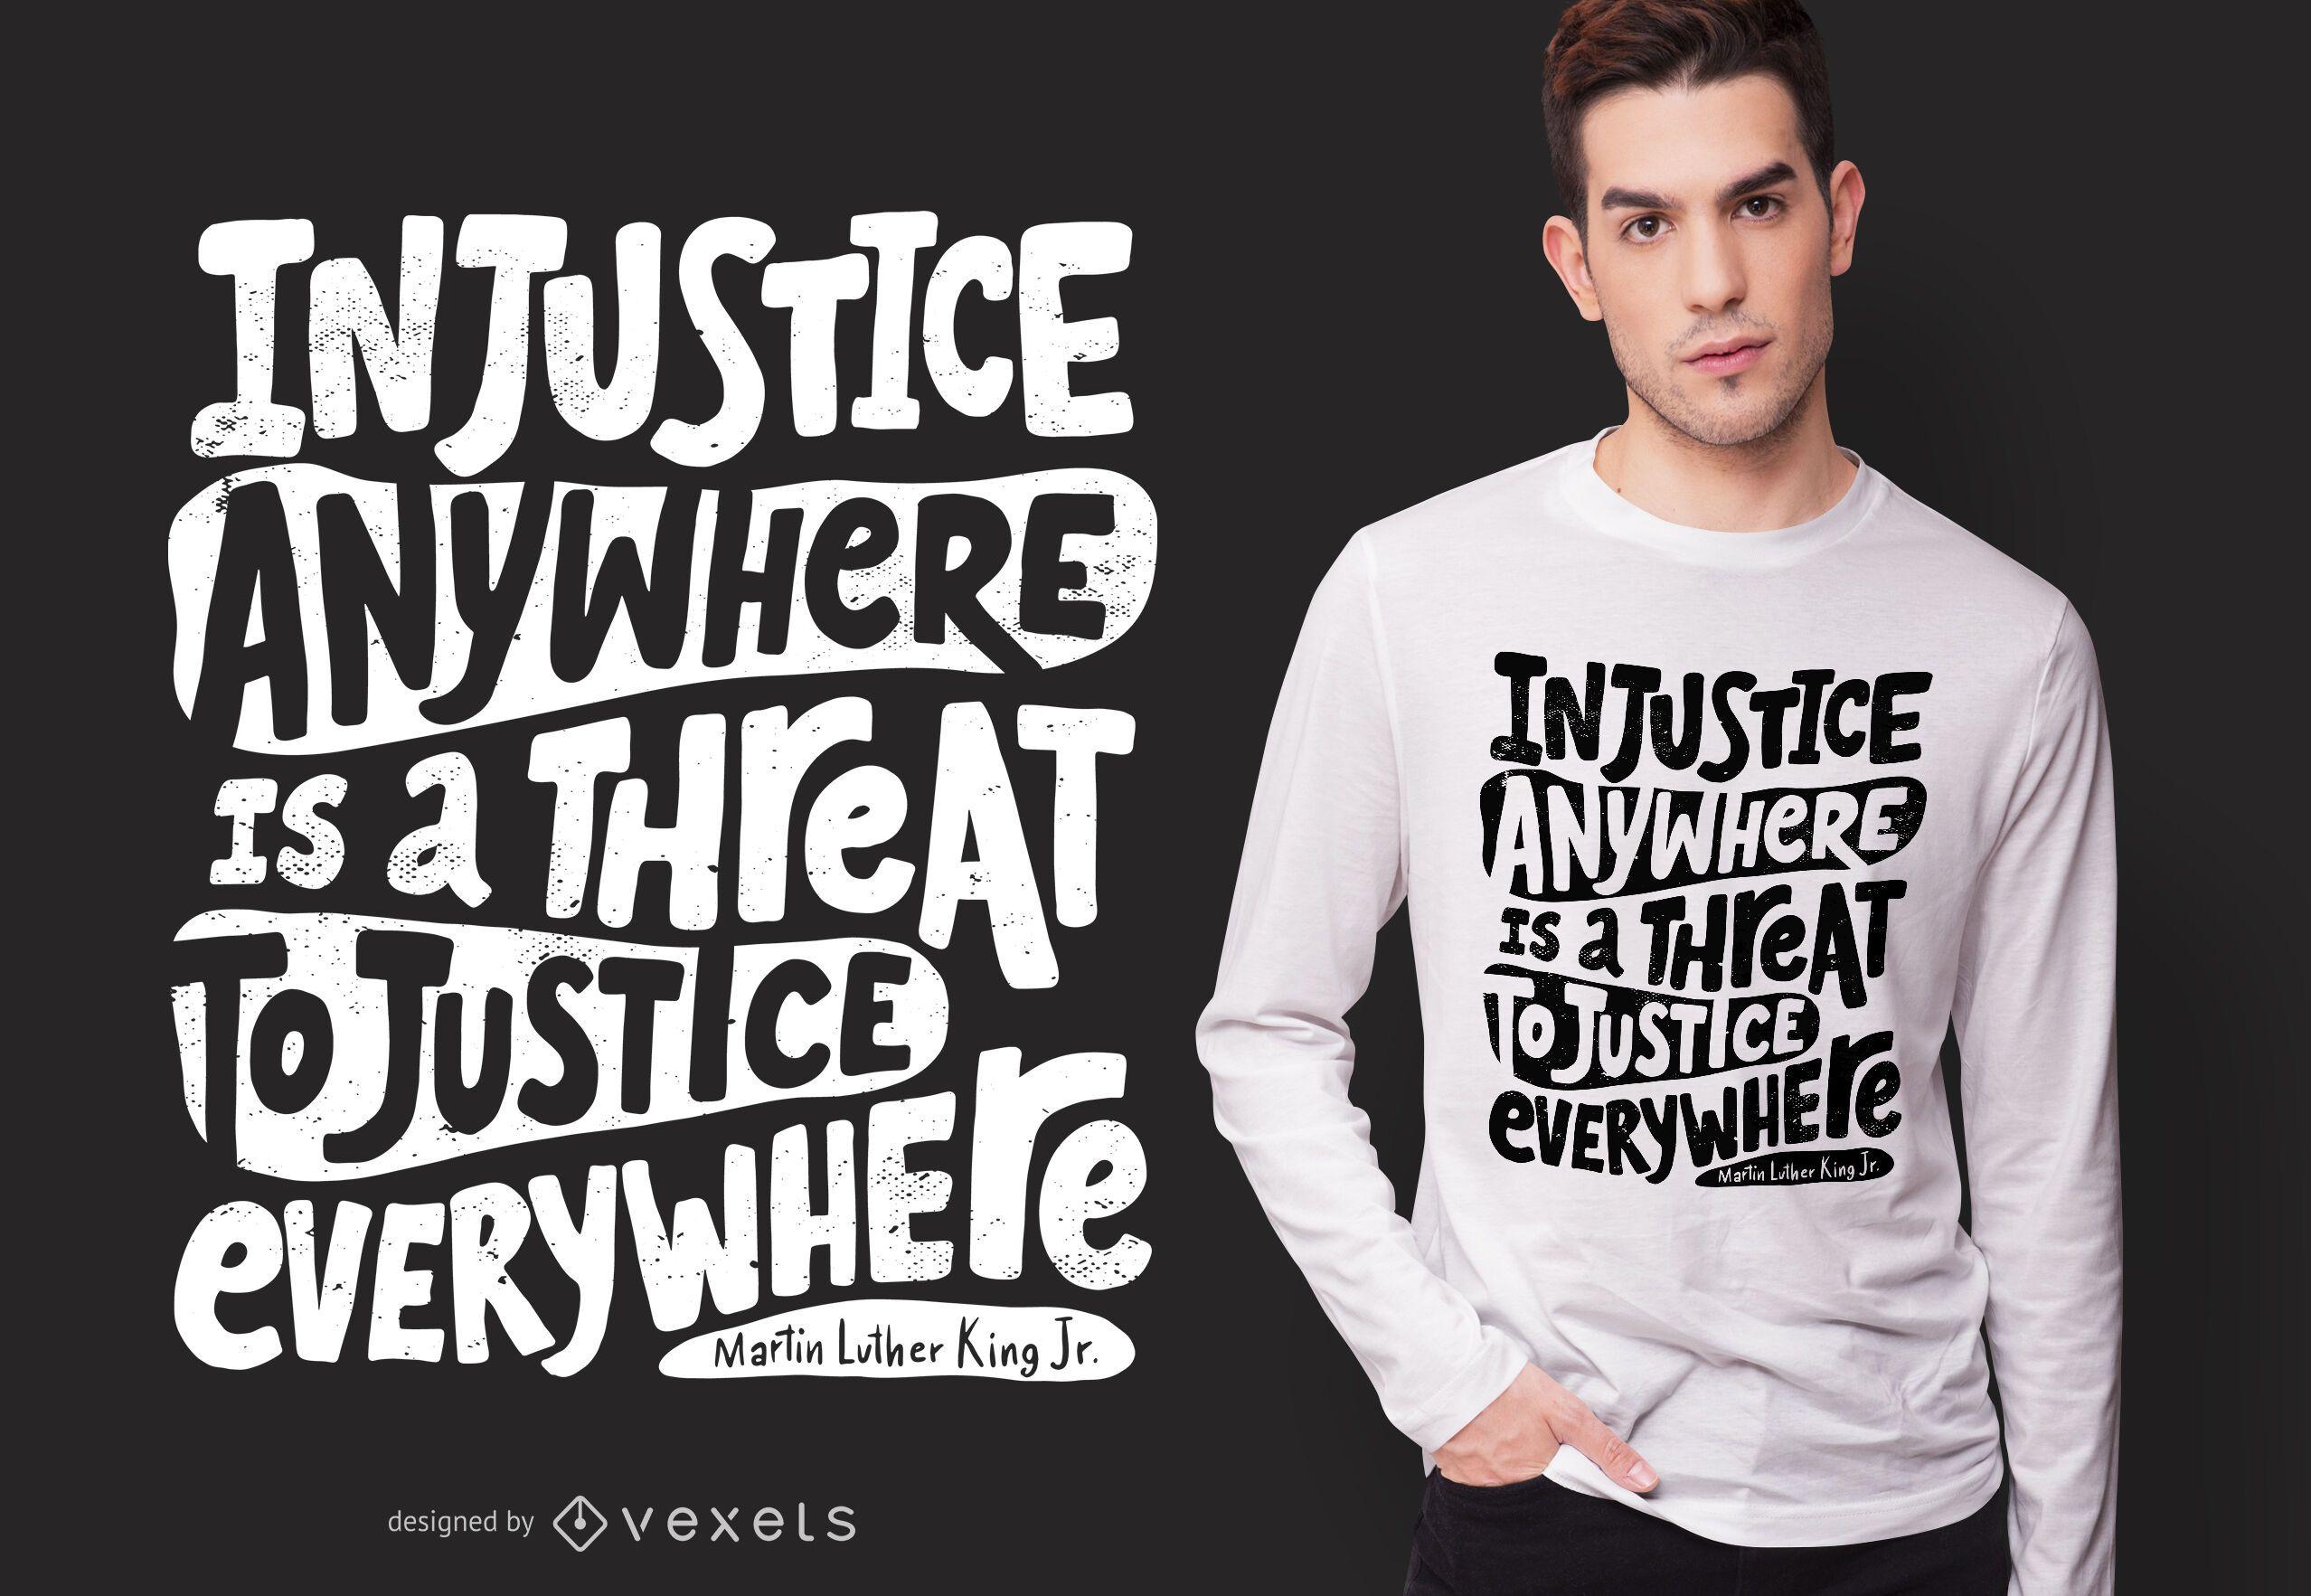 Social Injustice Quote T-shirt Design